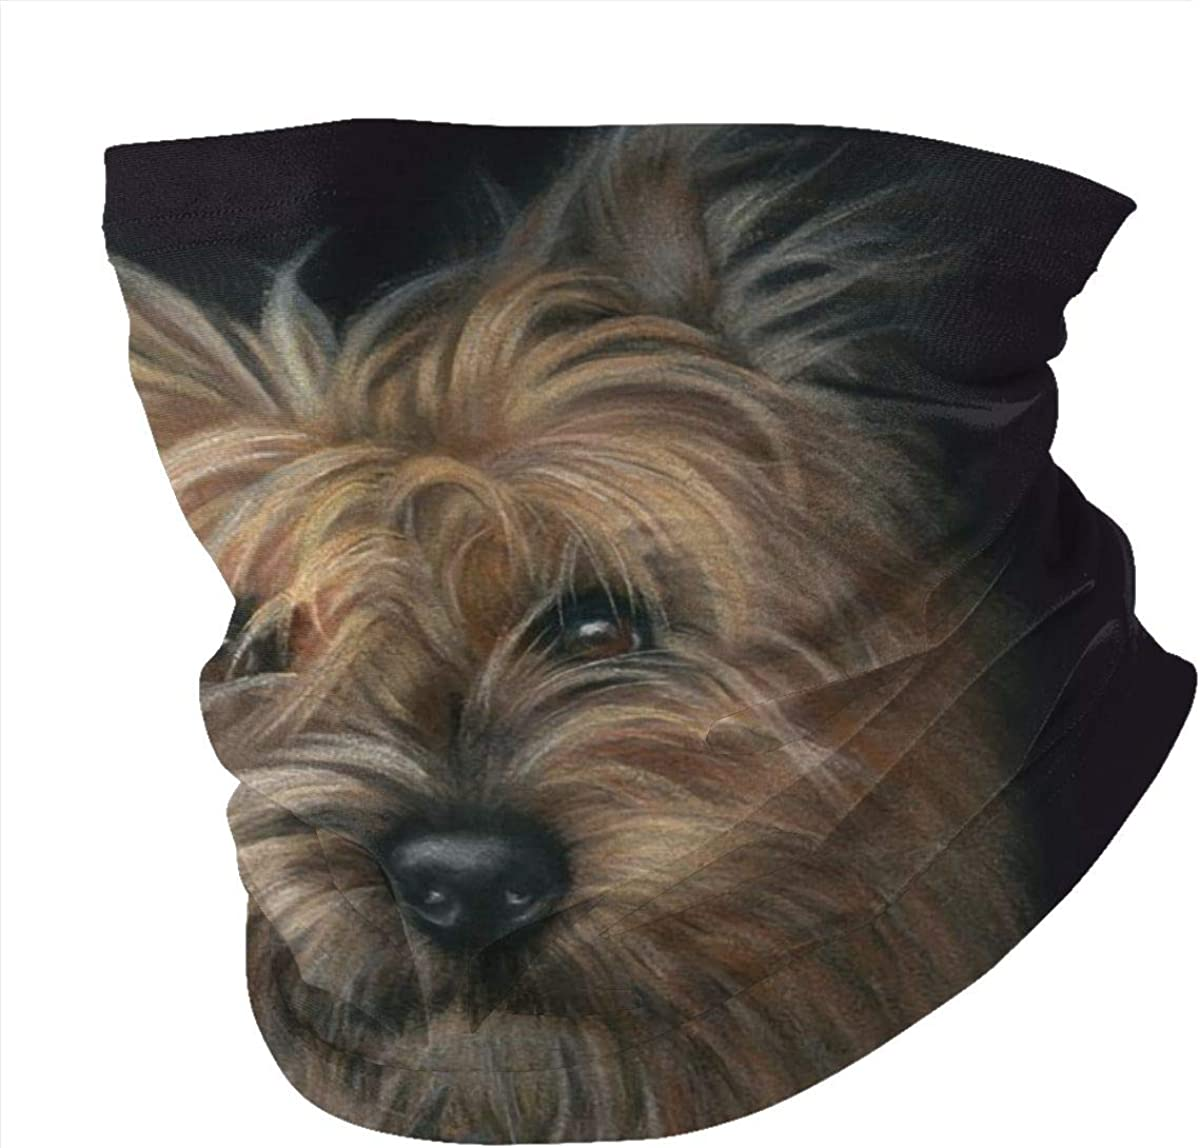 Cairn Terrier Cute Charm Retro Art Headband Headwear Windbreak Scarf Face Mask Washable Dust Mask Balaclava Neck Bandana